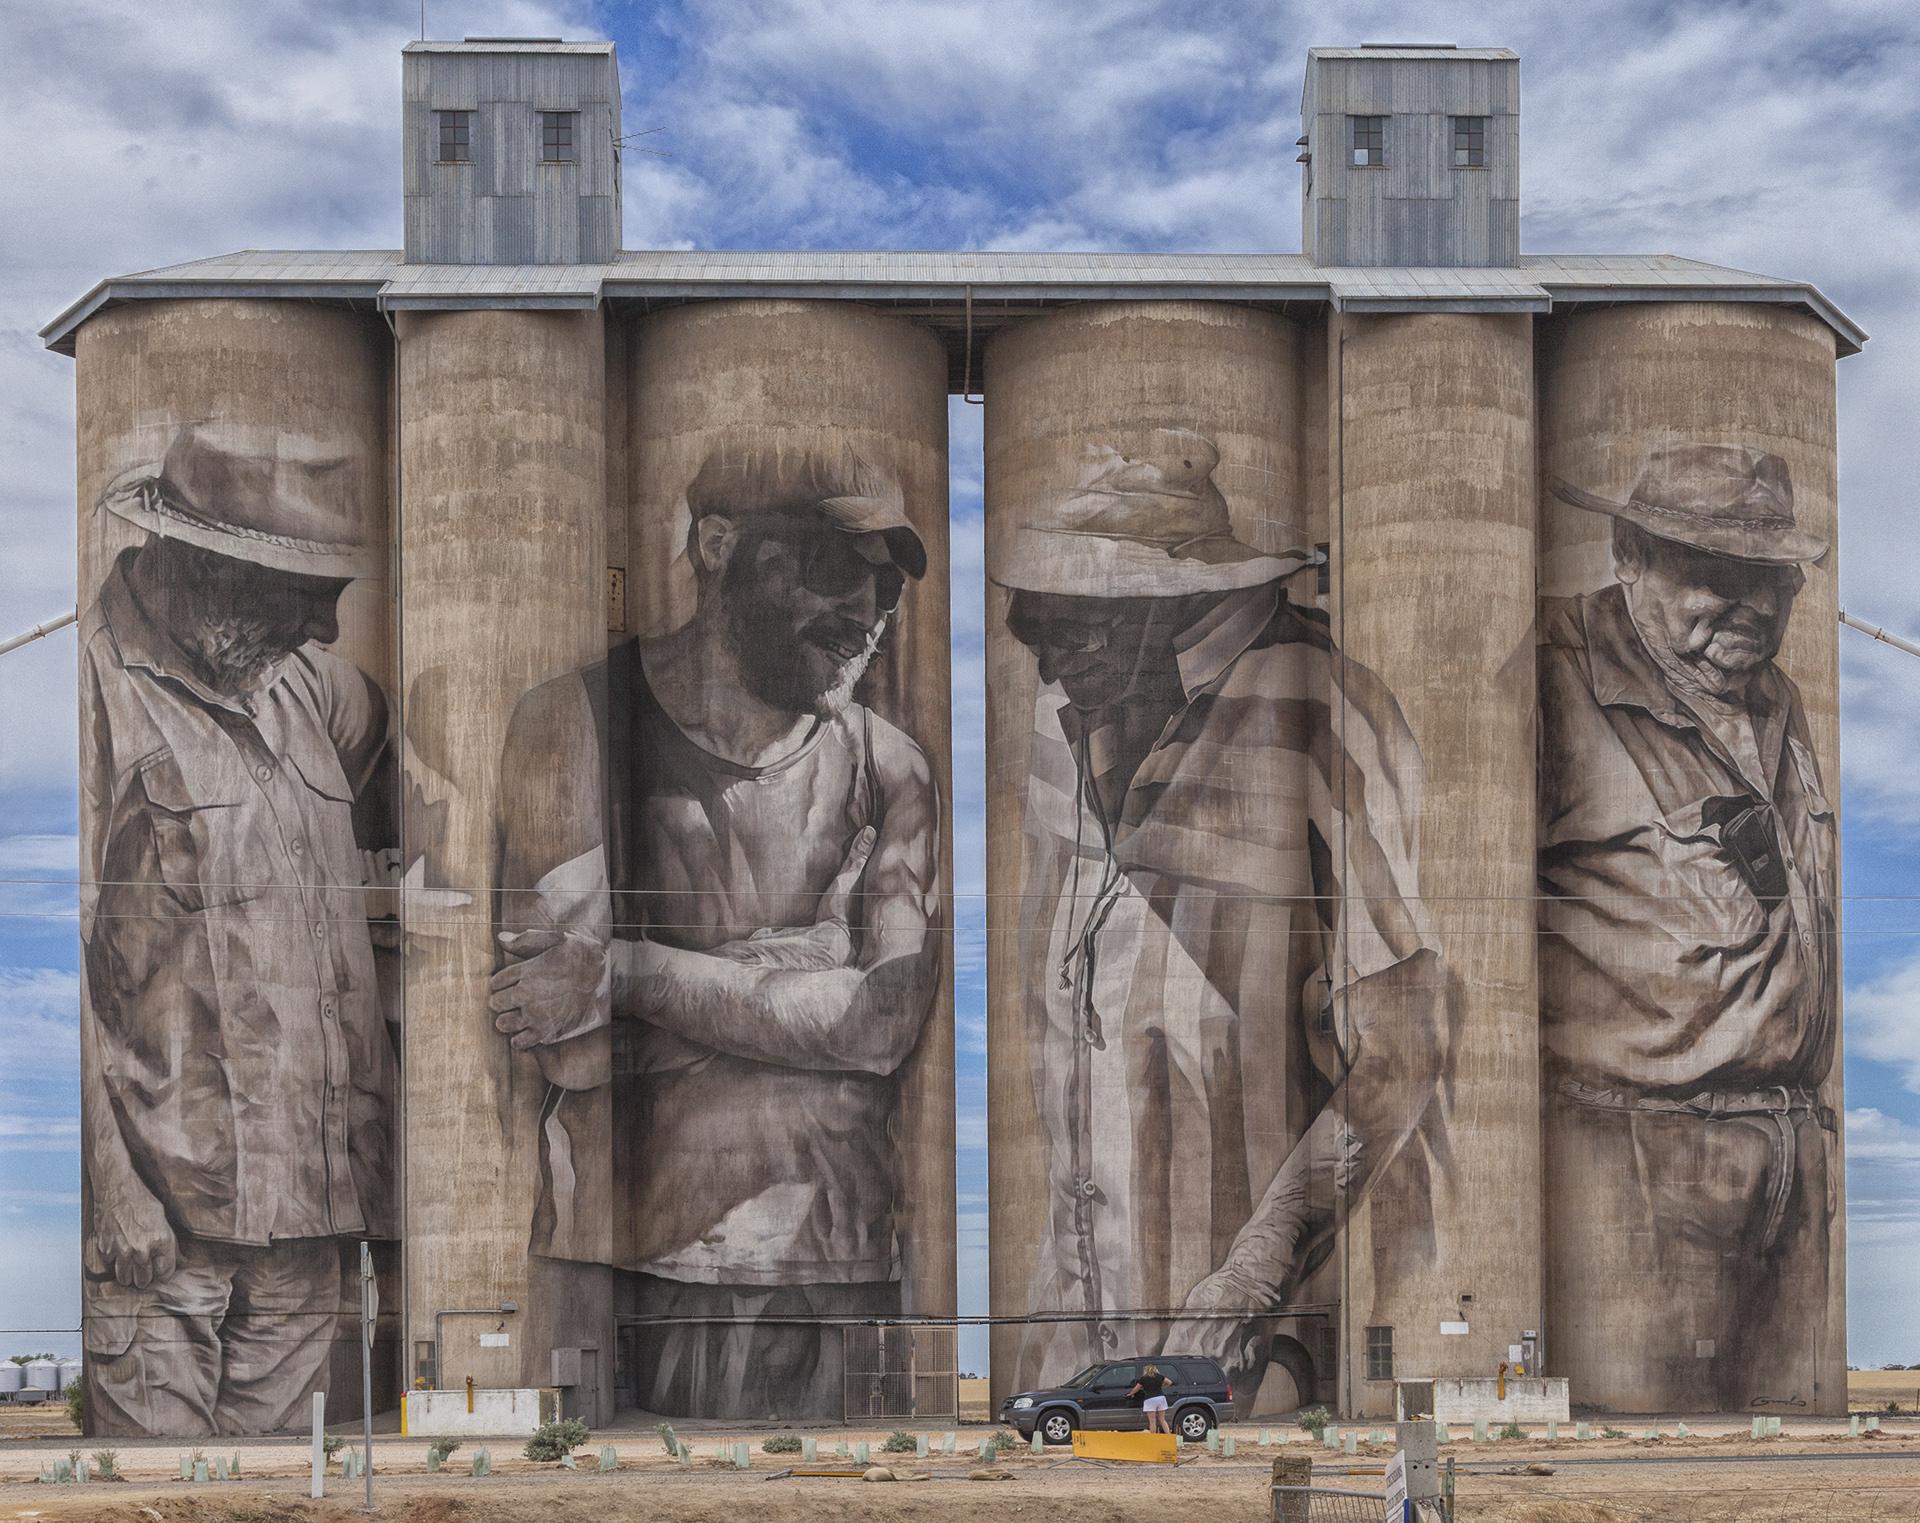 Painted silos in Australia